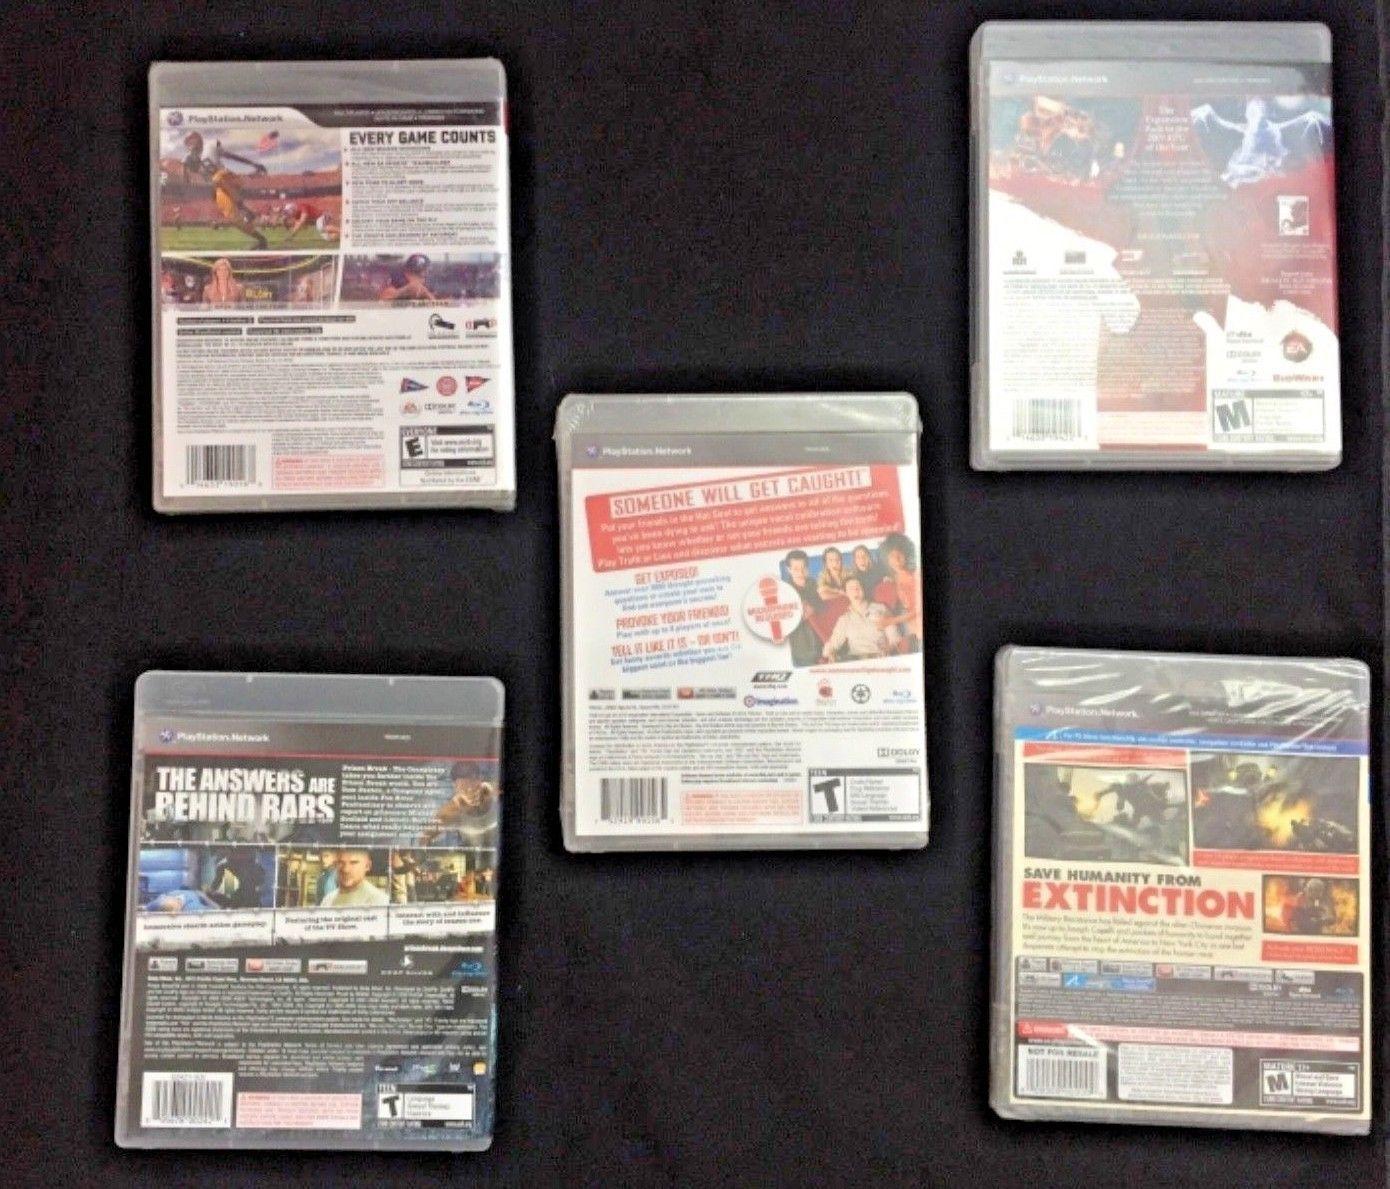 PS3 Video Games (see description)